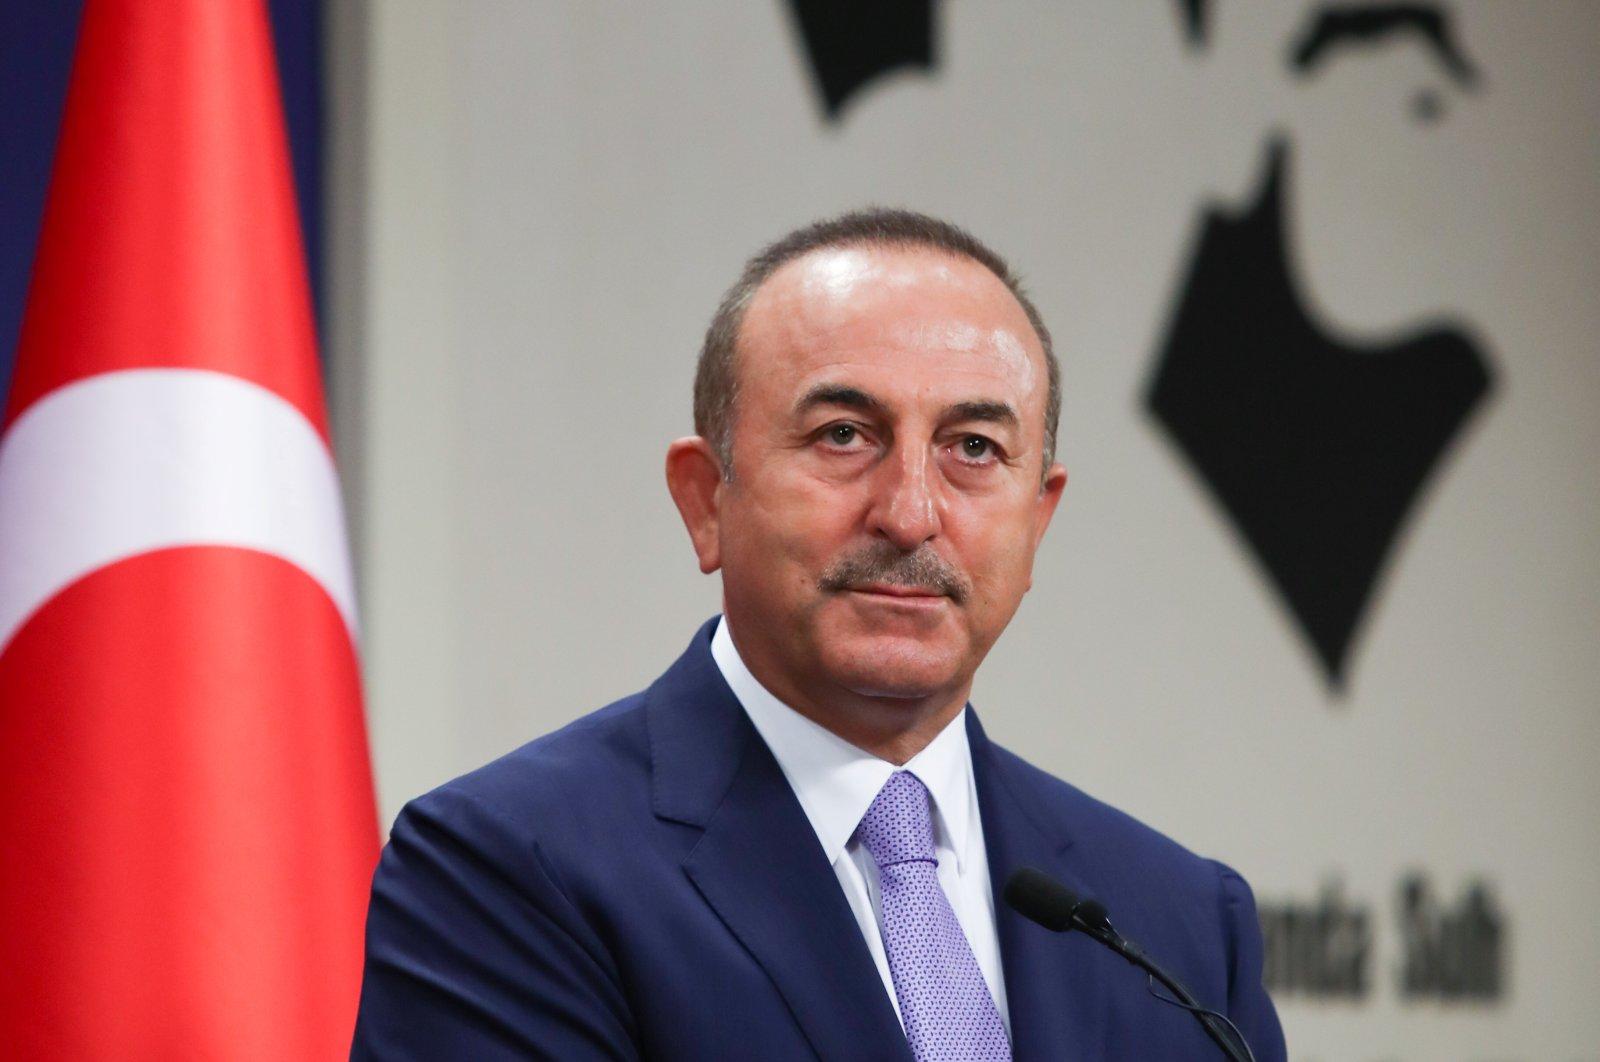 Turkish Foreign Minister Mevlüt Çavuşoğlu attends a news conference in Ankara, Turkey Aug. 11, 2020. (Reuters Photo)